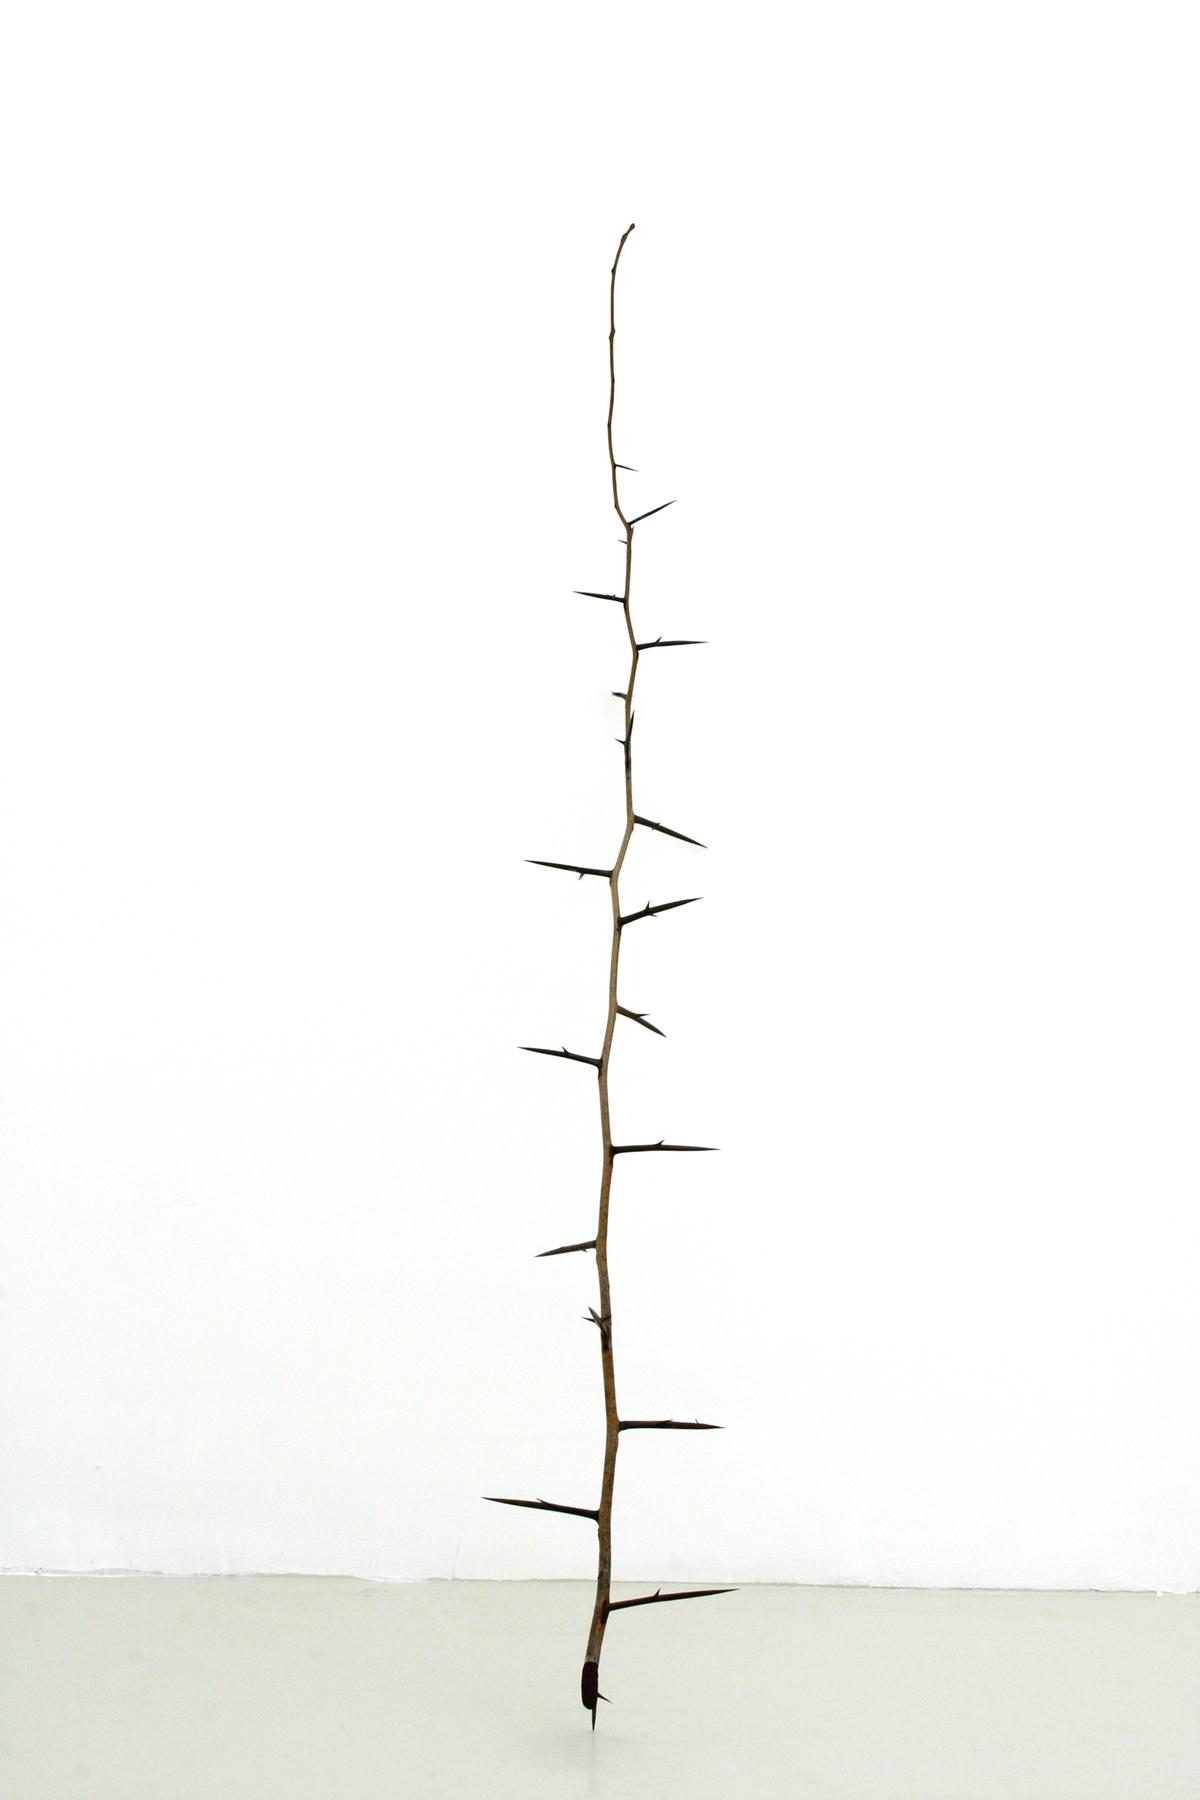 Untitled, 2006, carrob branch, cm 123 x 5